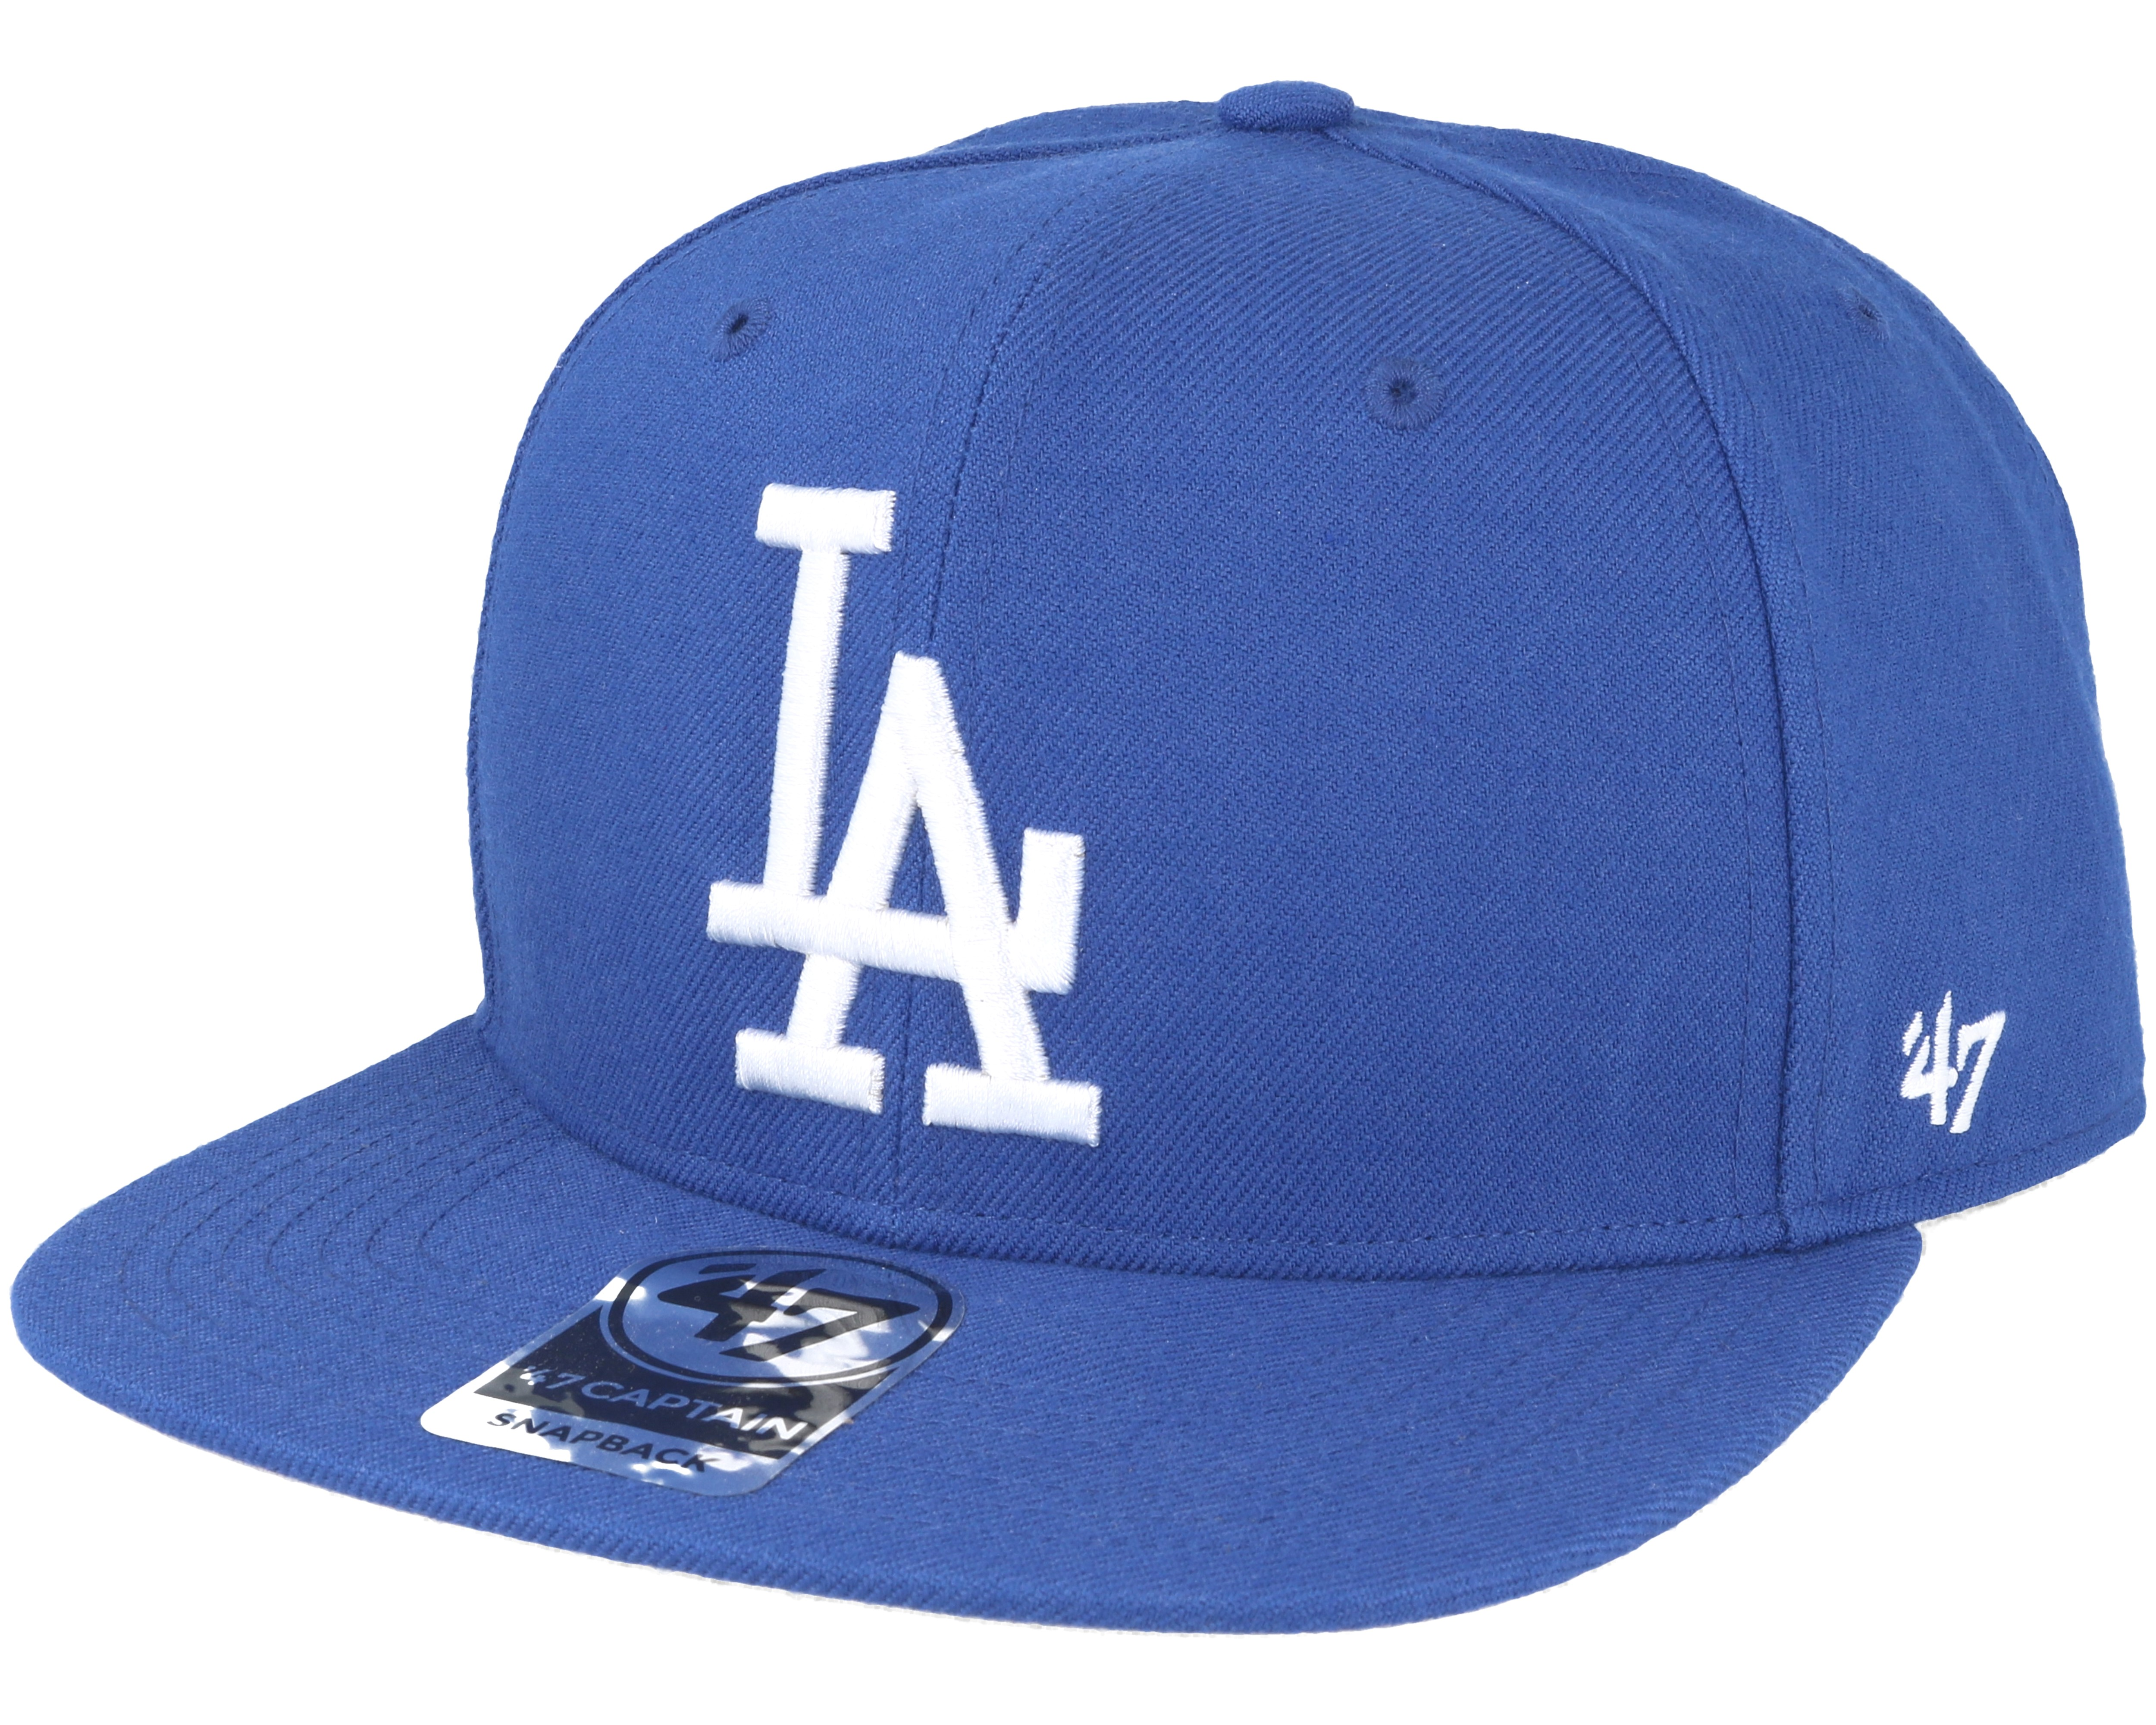 online retailer 49894 f4bc5 Los Angeles Dodgers Sure Shot Royal Blue Snapback - 47 Brand